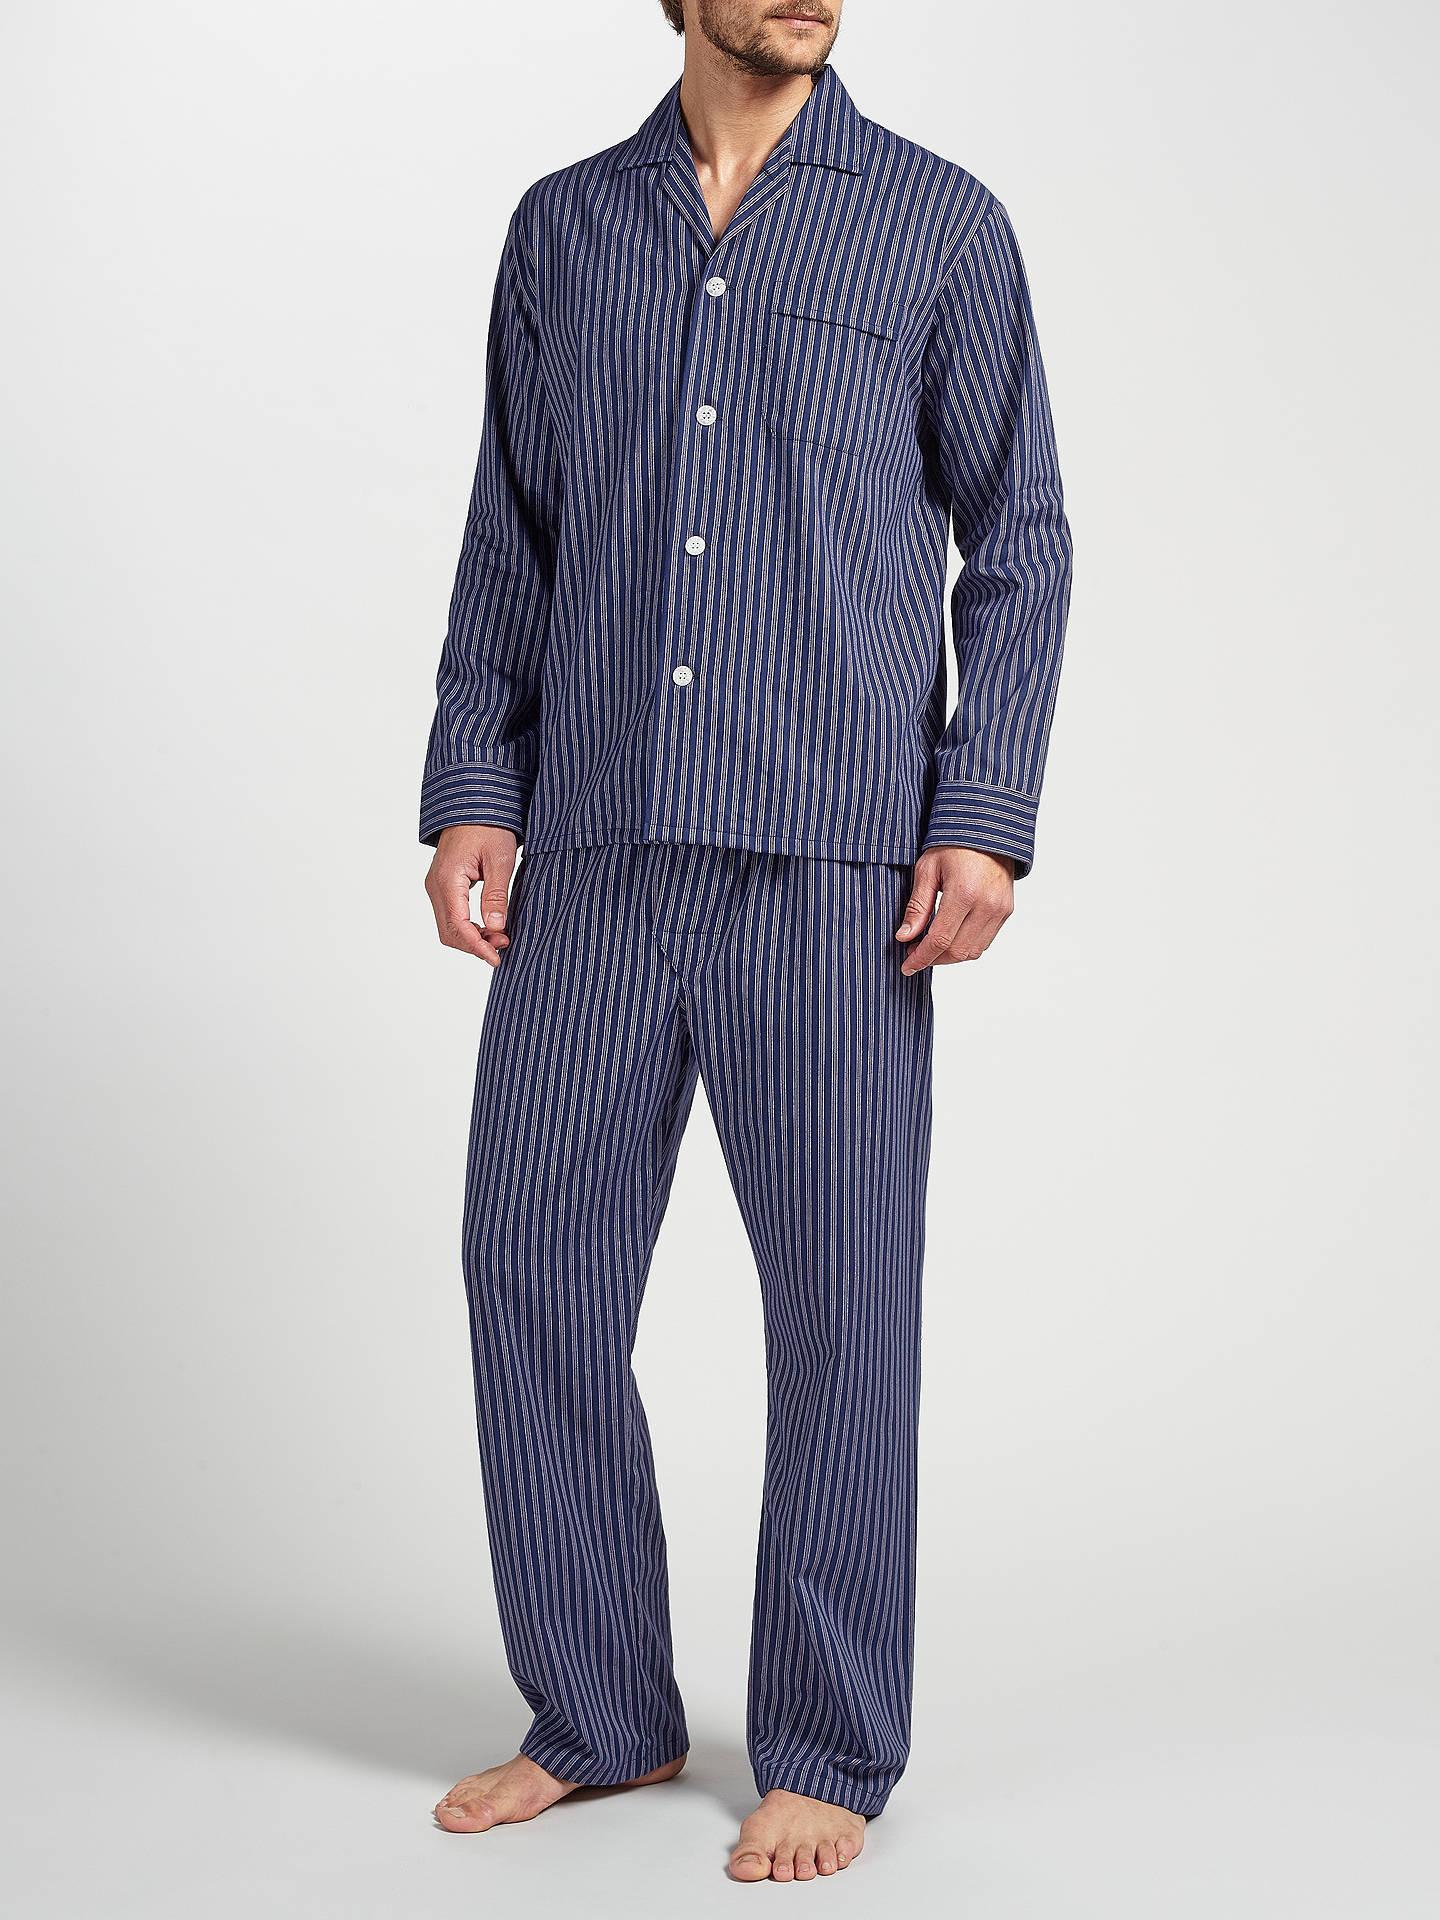 BuyDerek Rose Stripe Brushed Cotton Pyjamas 3e89cb7e8